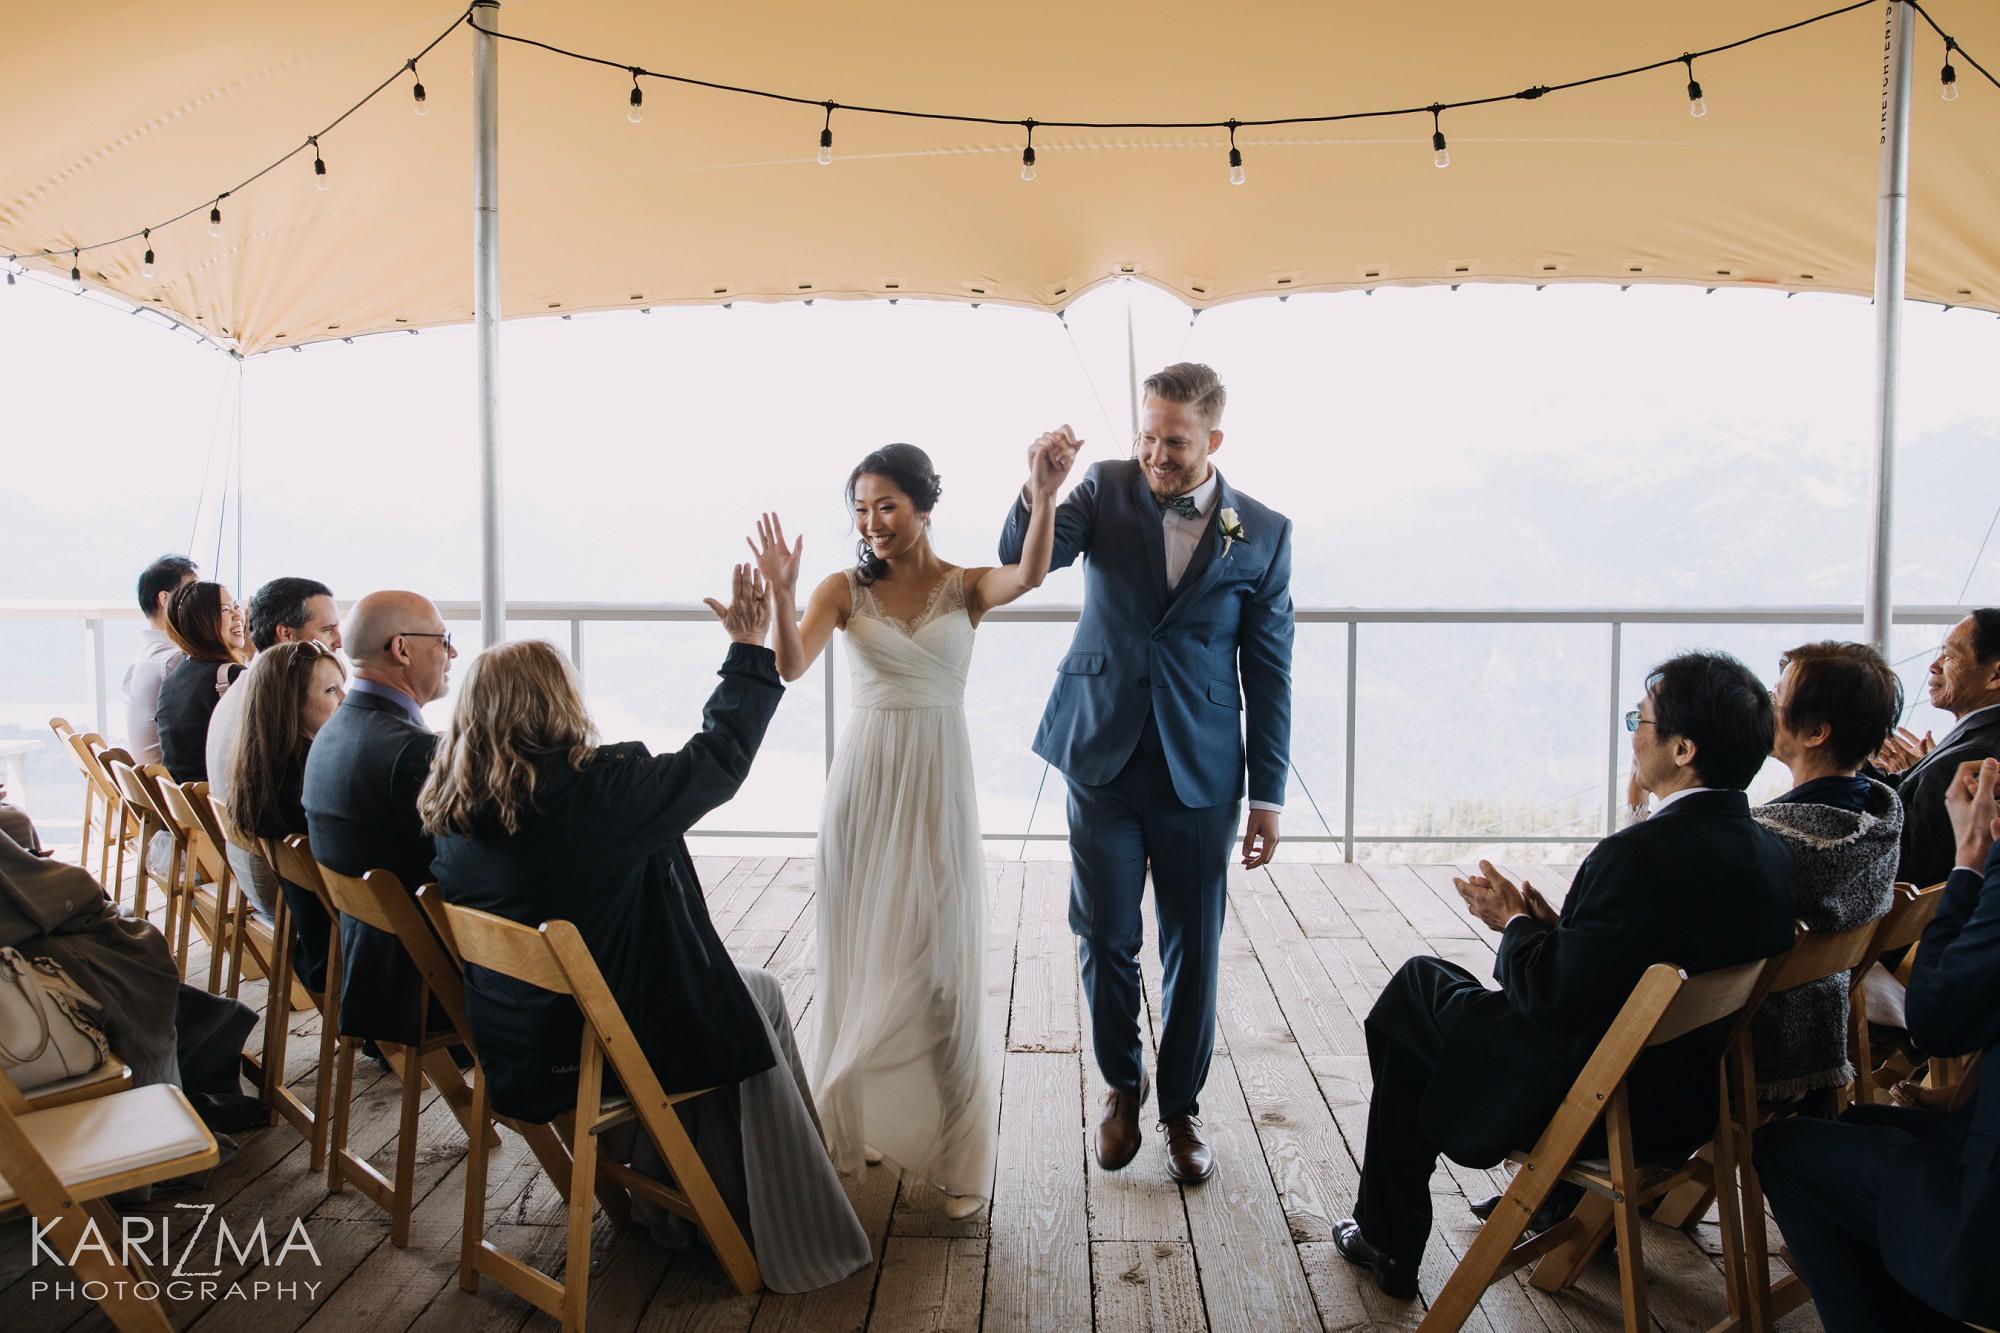 Sea to Sky Gondola Wedding Summit Lodge Viewing Deck